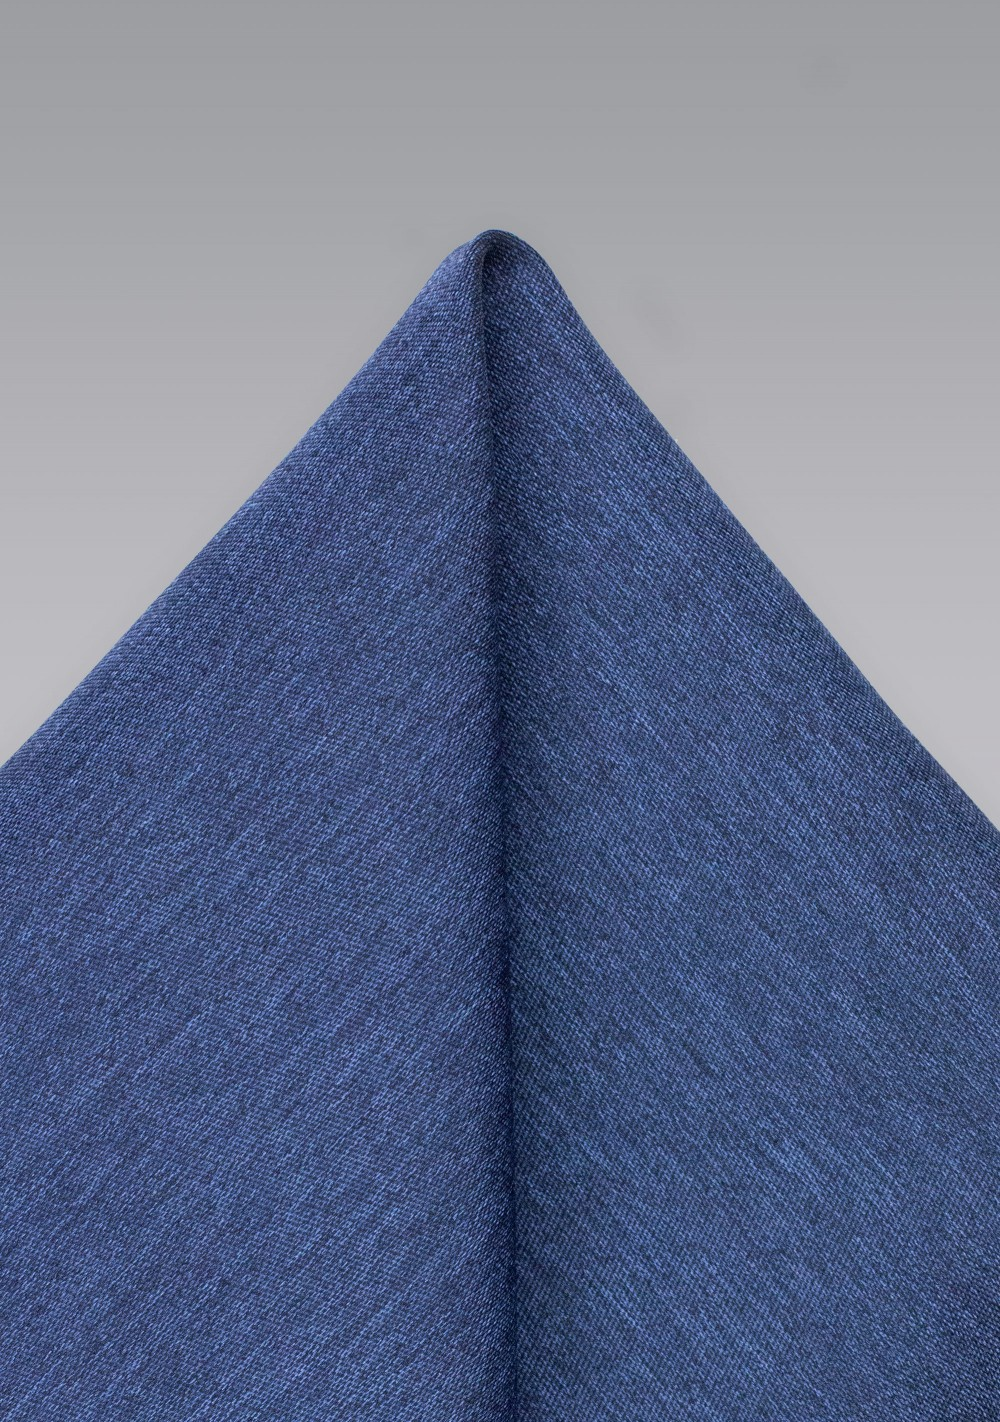 Slate Blue Mens Pocket Square